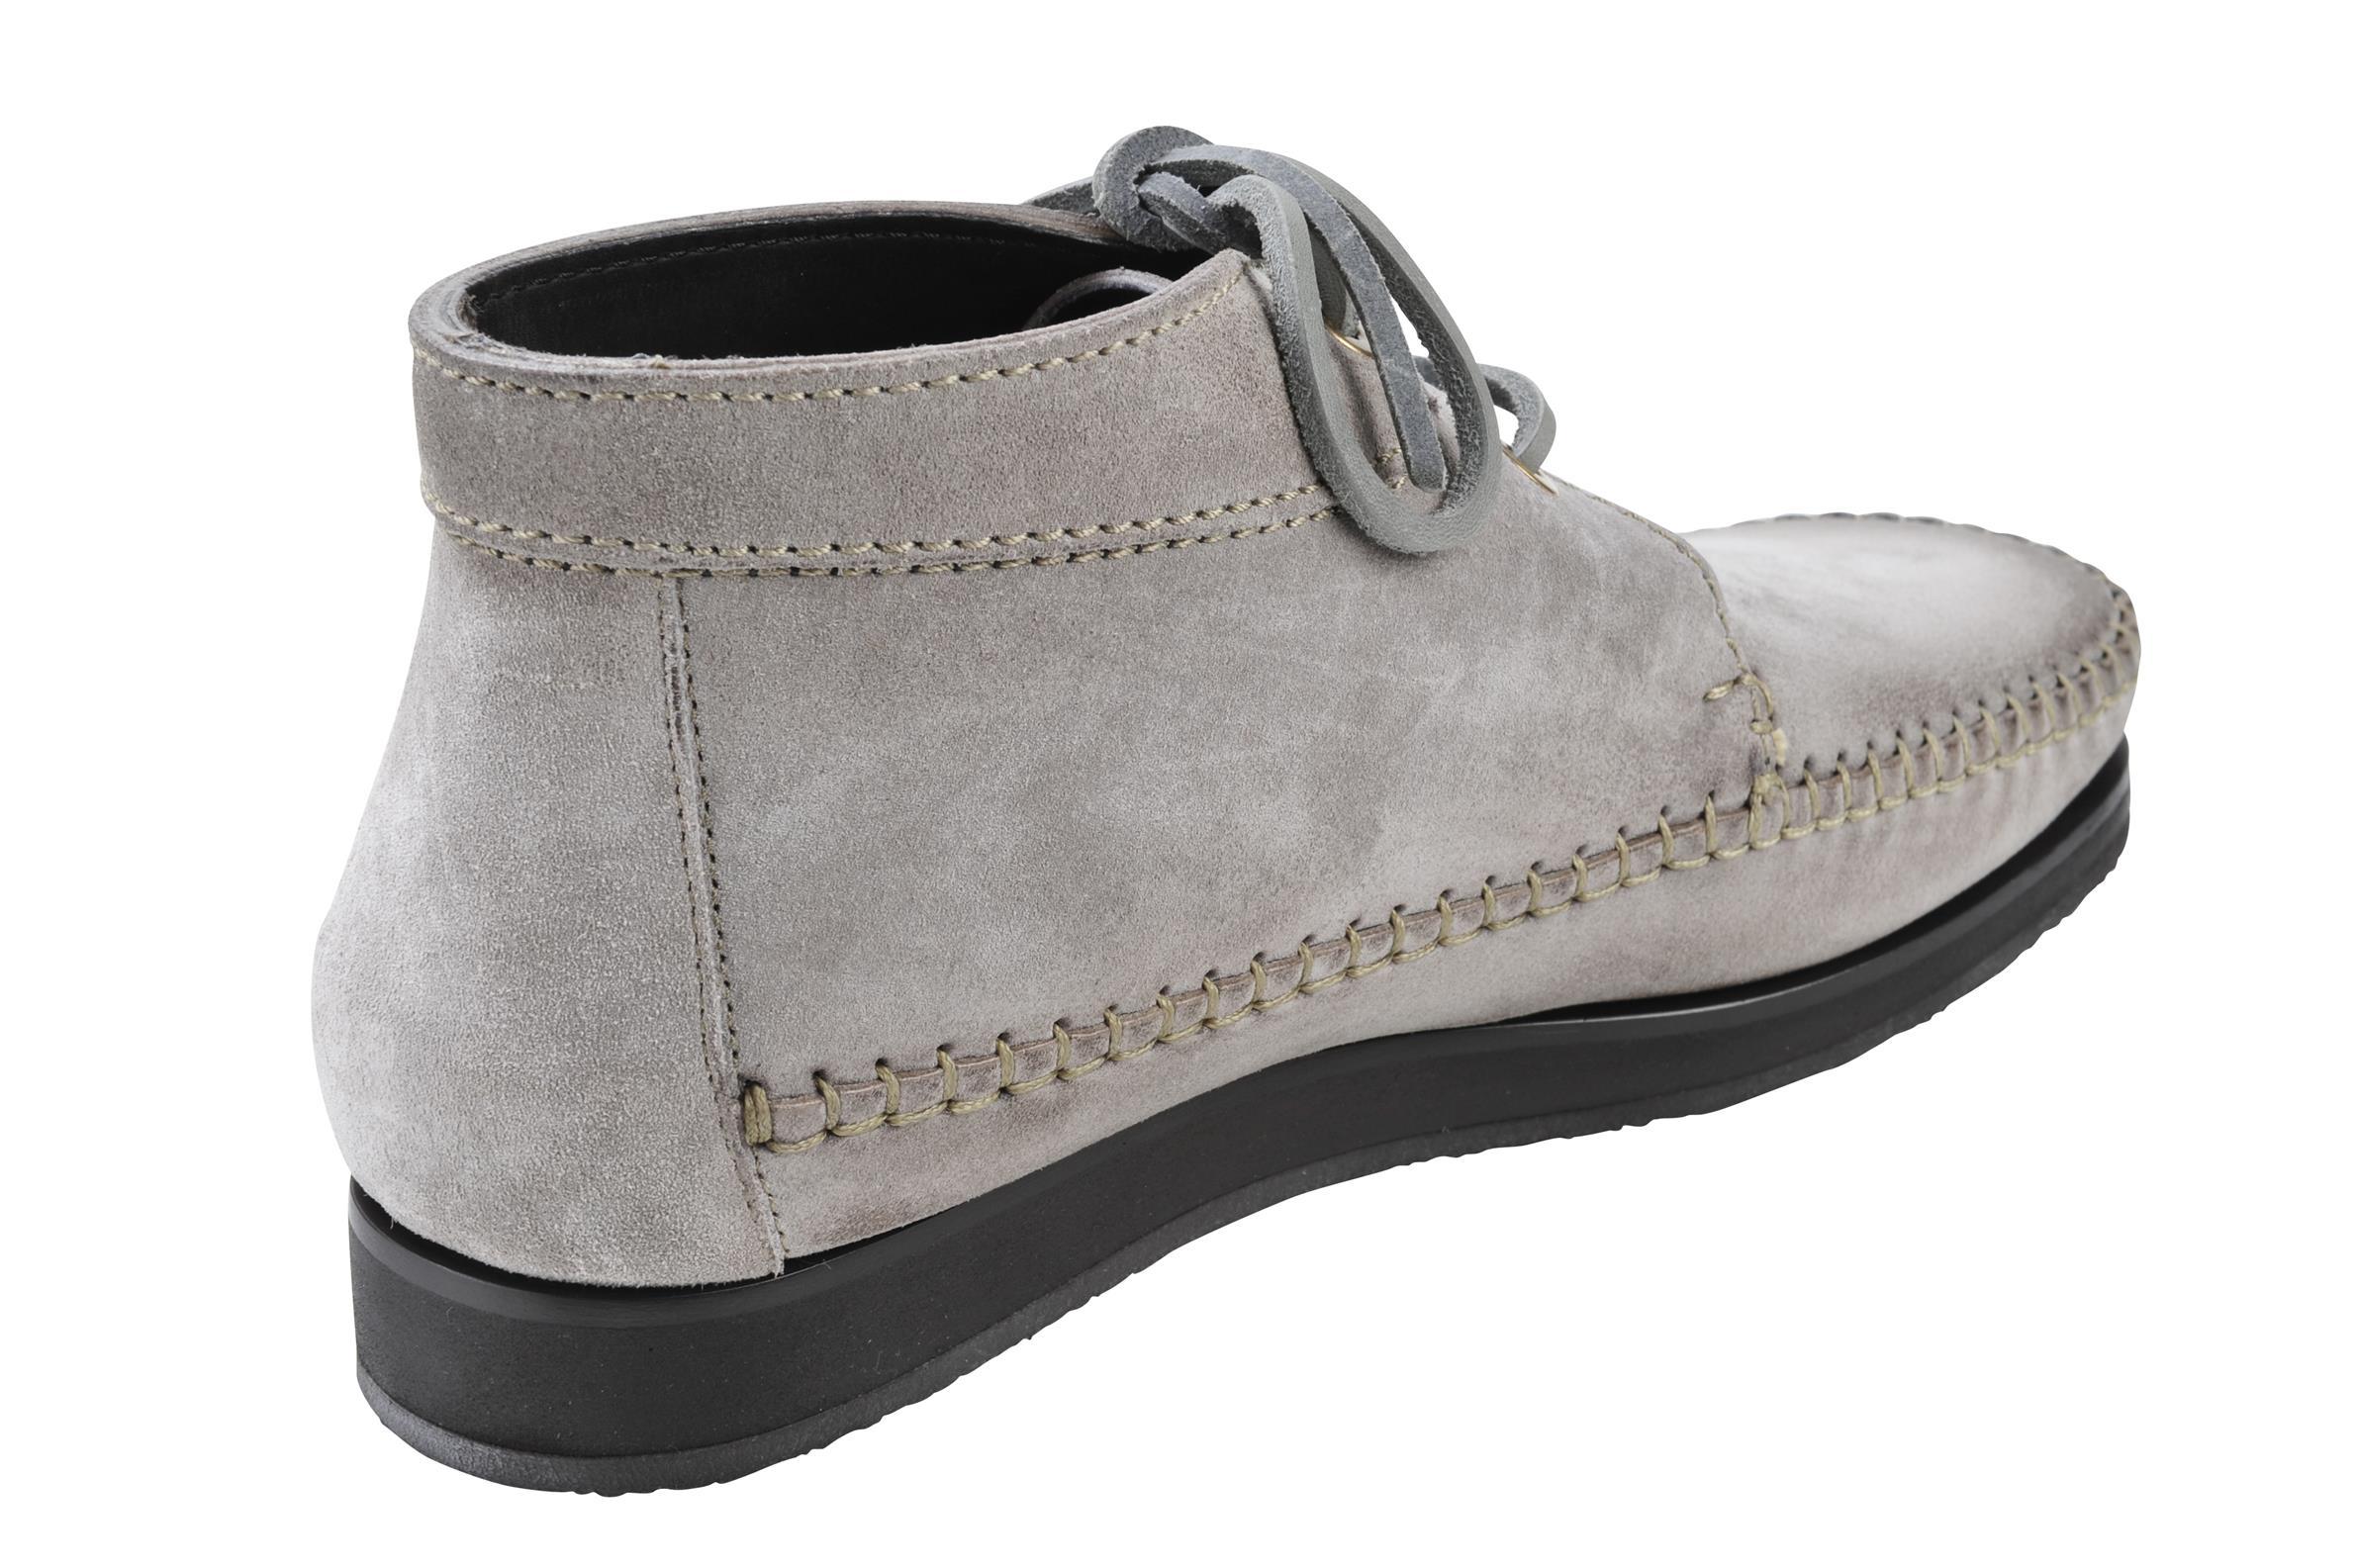 12cb50239fc6a3 Tom Ford IT Schuhe Herren Wildleder 43 Stiefel Boots Grau